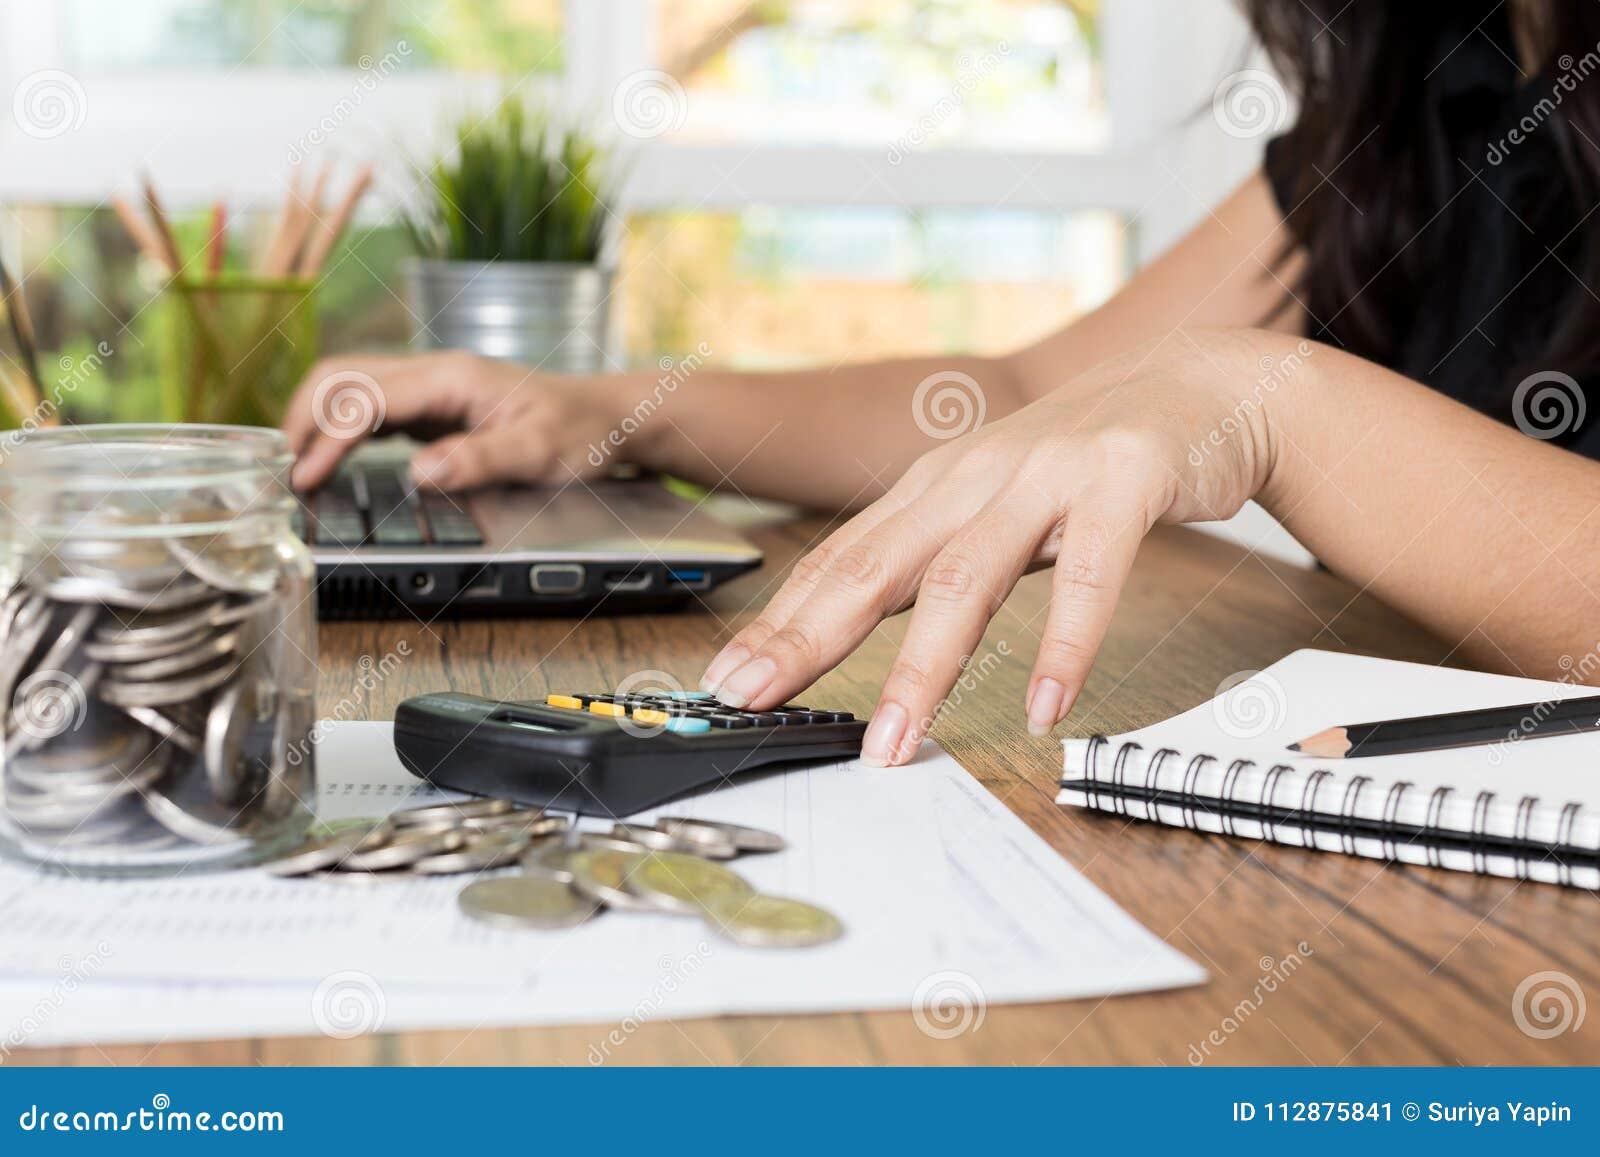 Saving money and finances concept,